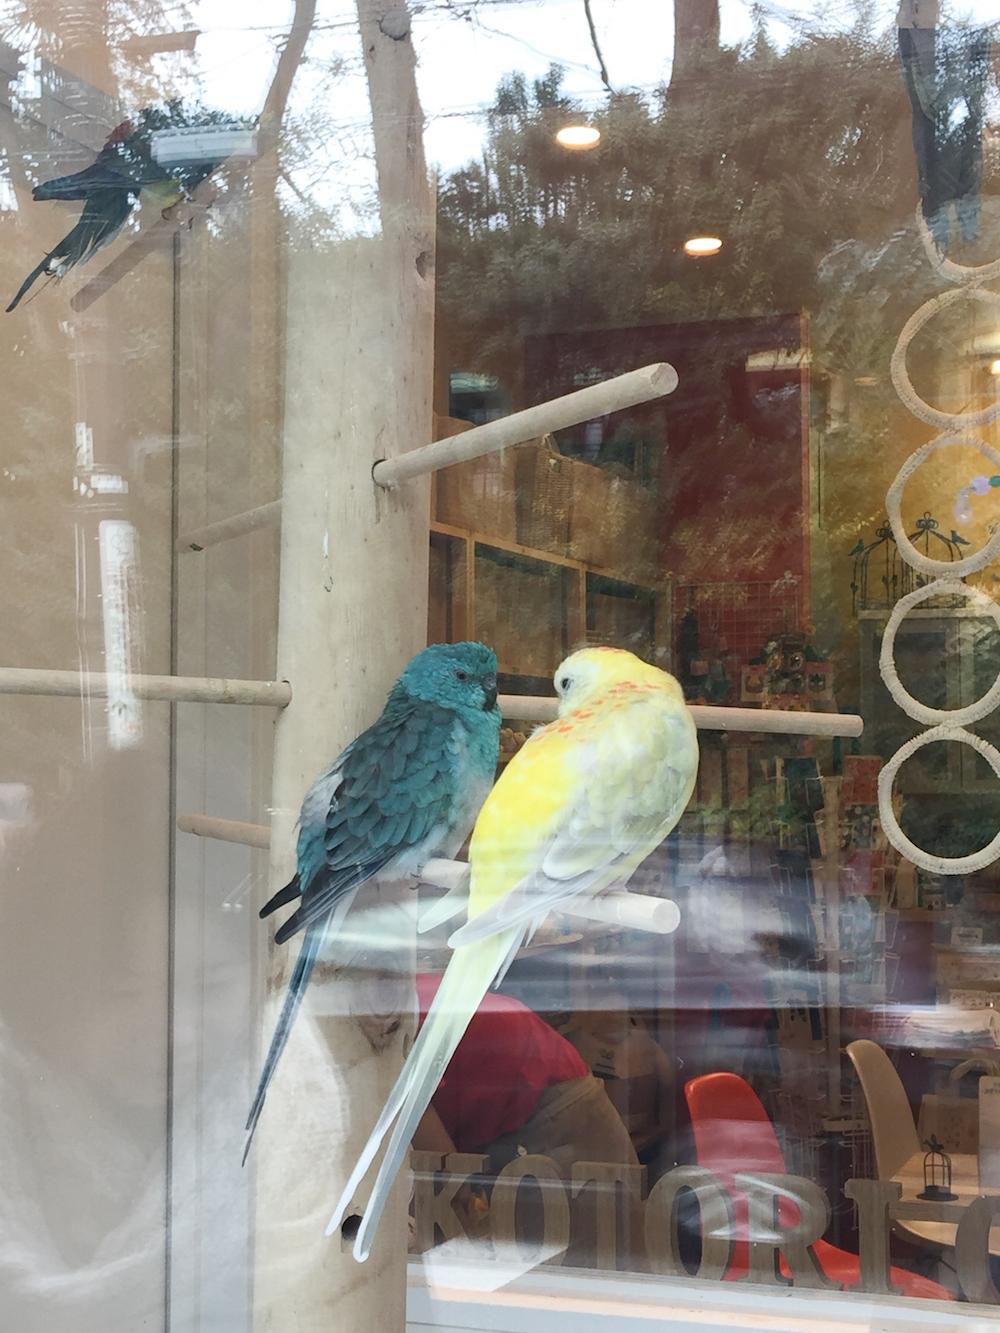 papagei-cafe-vogel-tokyo